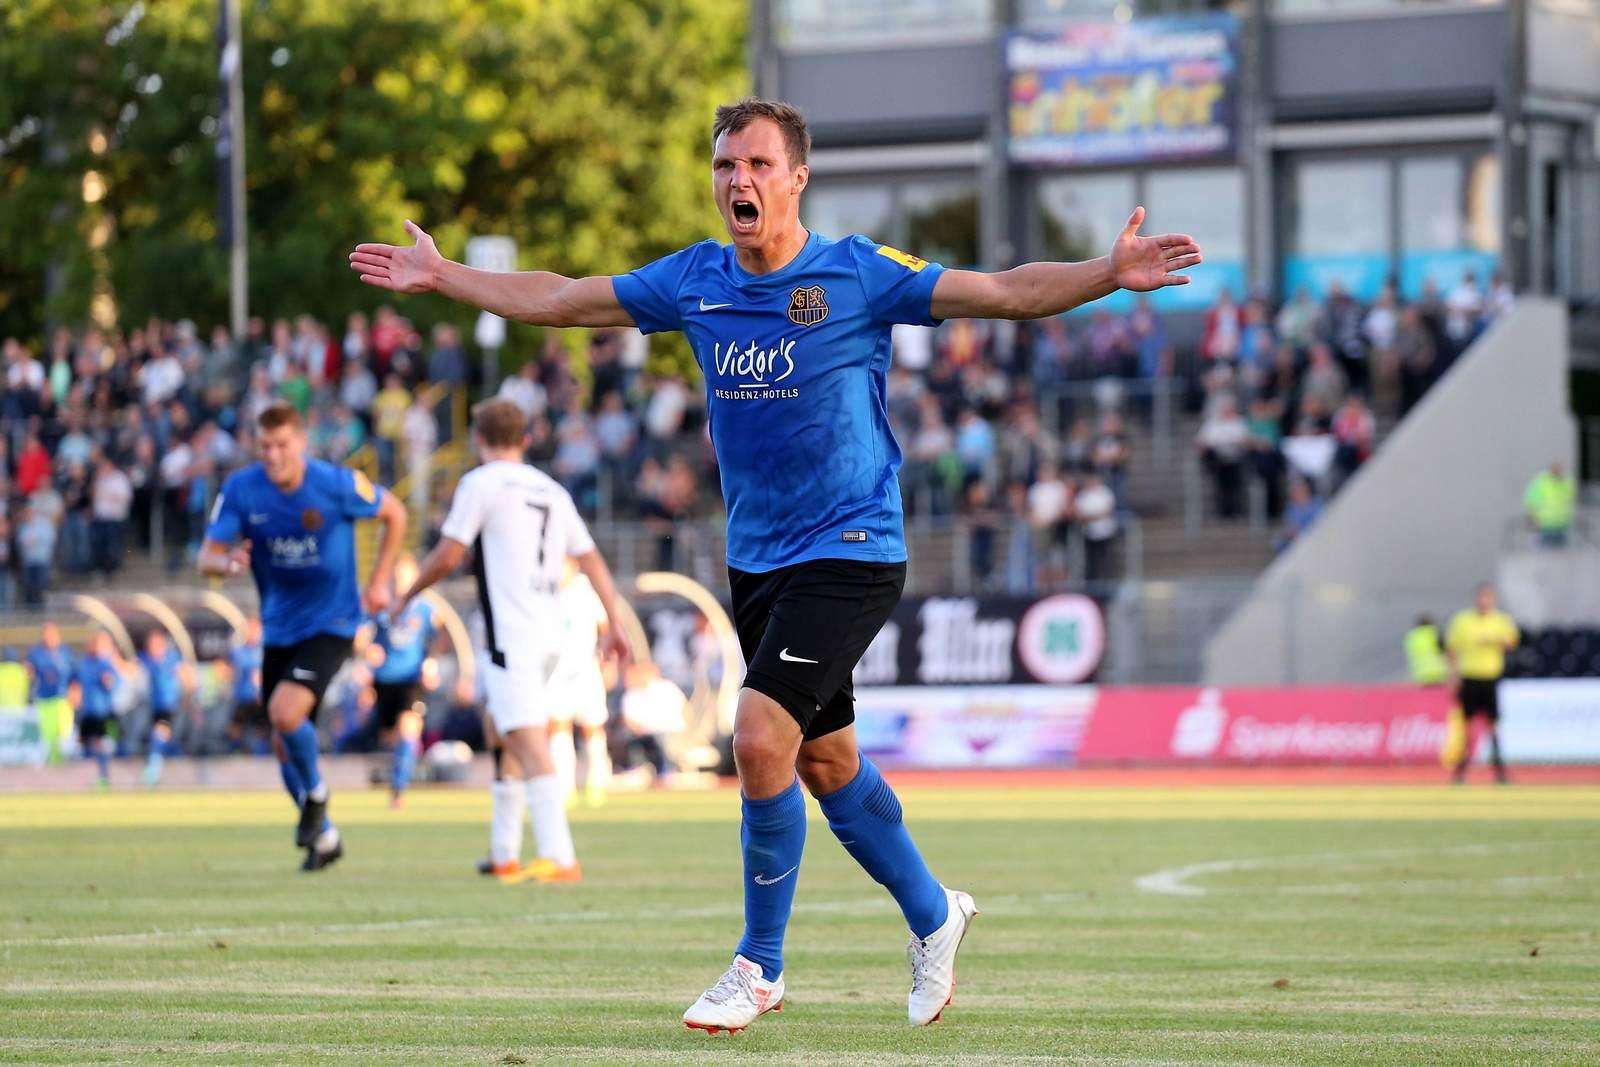 Tobias Jänicke vom 1. FC Saarbrücken